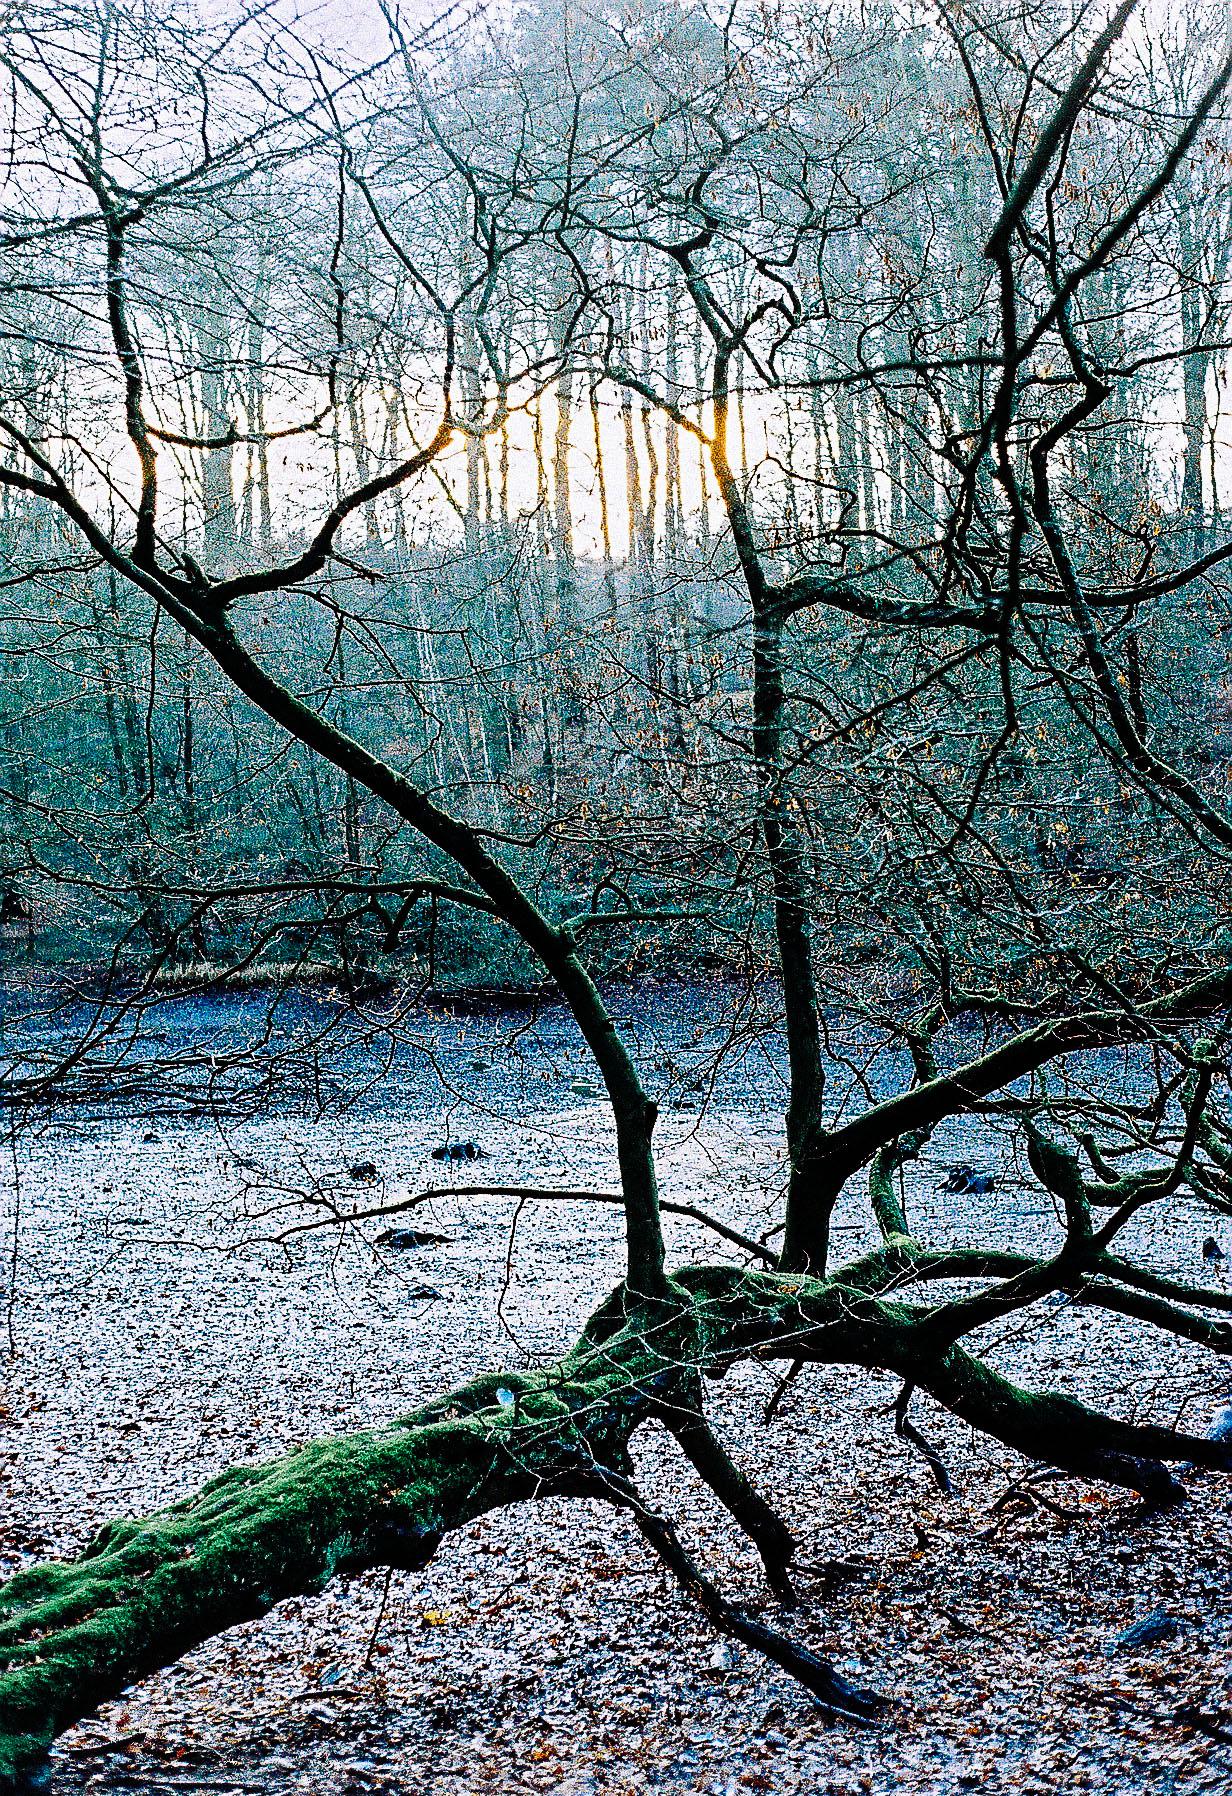 Hippodrome forest. Jan 2015 Yashica Electro nataliehillphotography.com